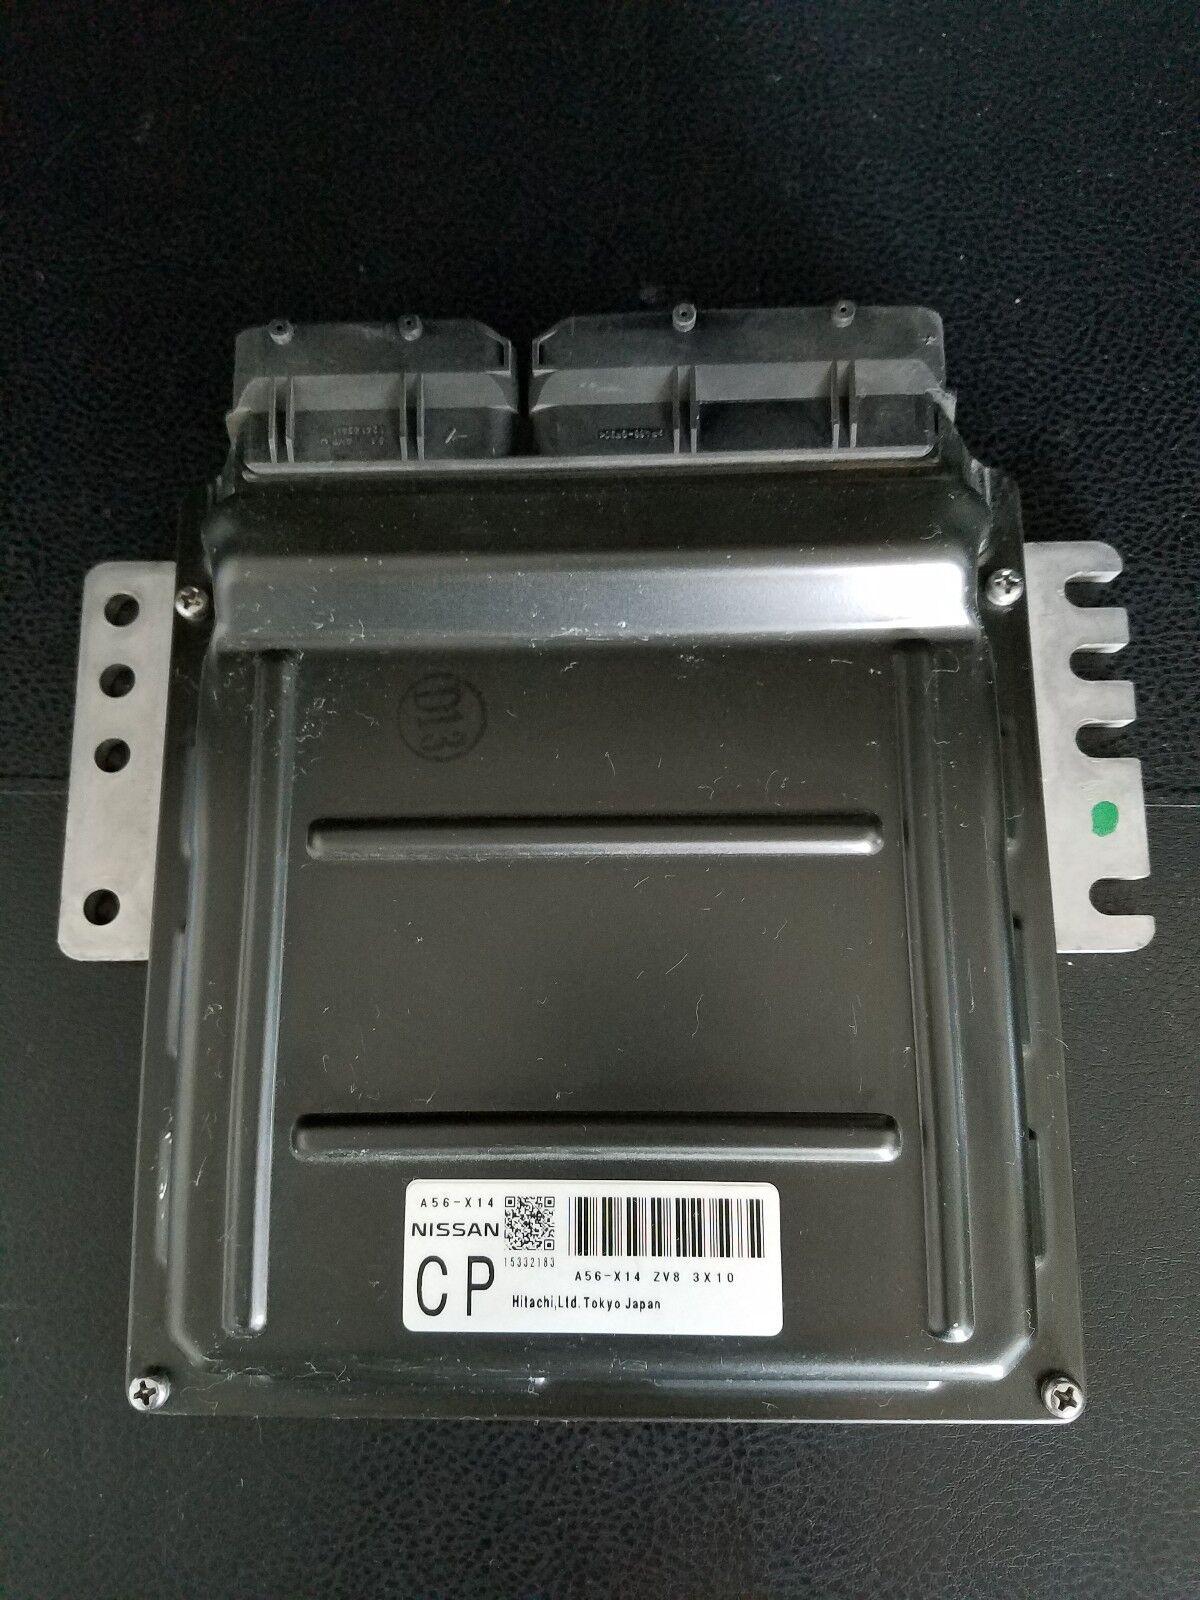 Used Nissan Maxima Engine Computers For Sale 2001 Ecm Location 2004 2005 Electronic Control Module Ecu A56 X14 Zv8